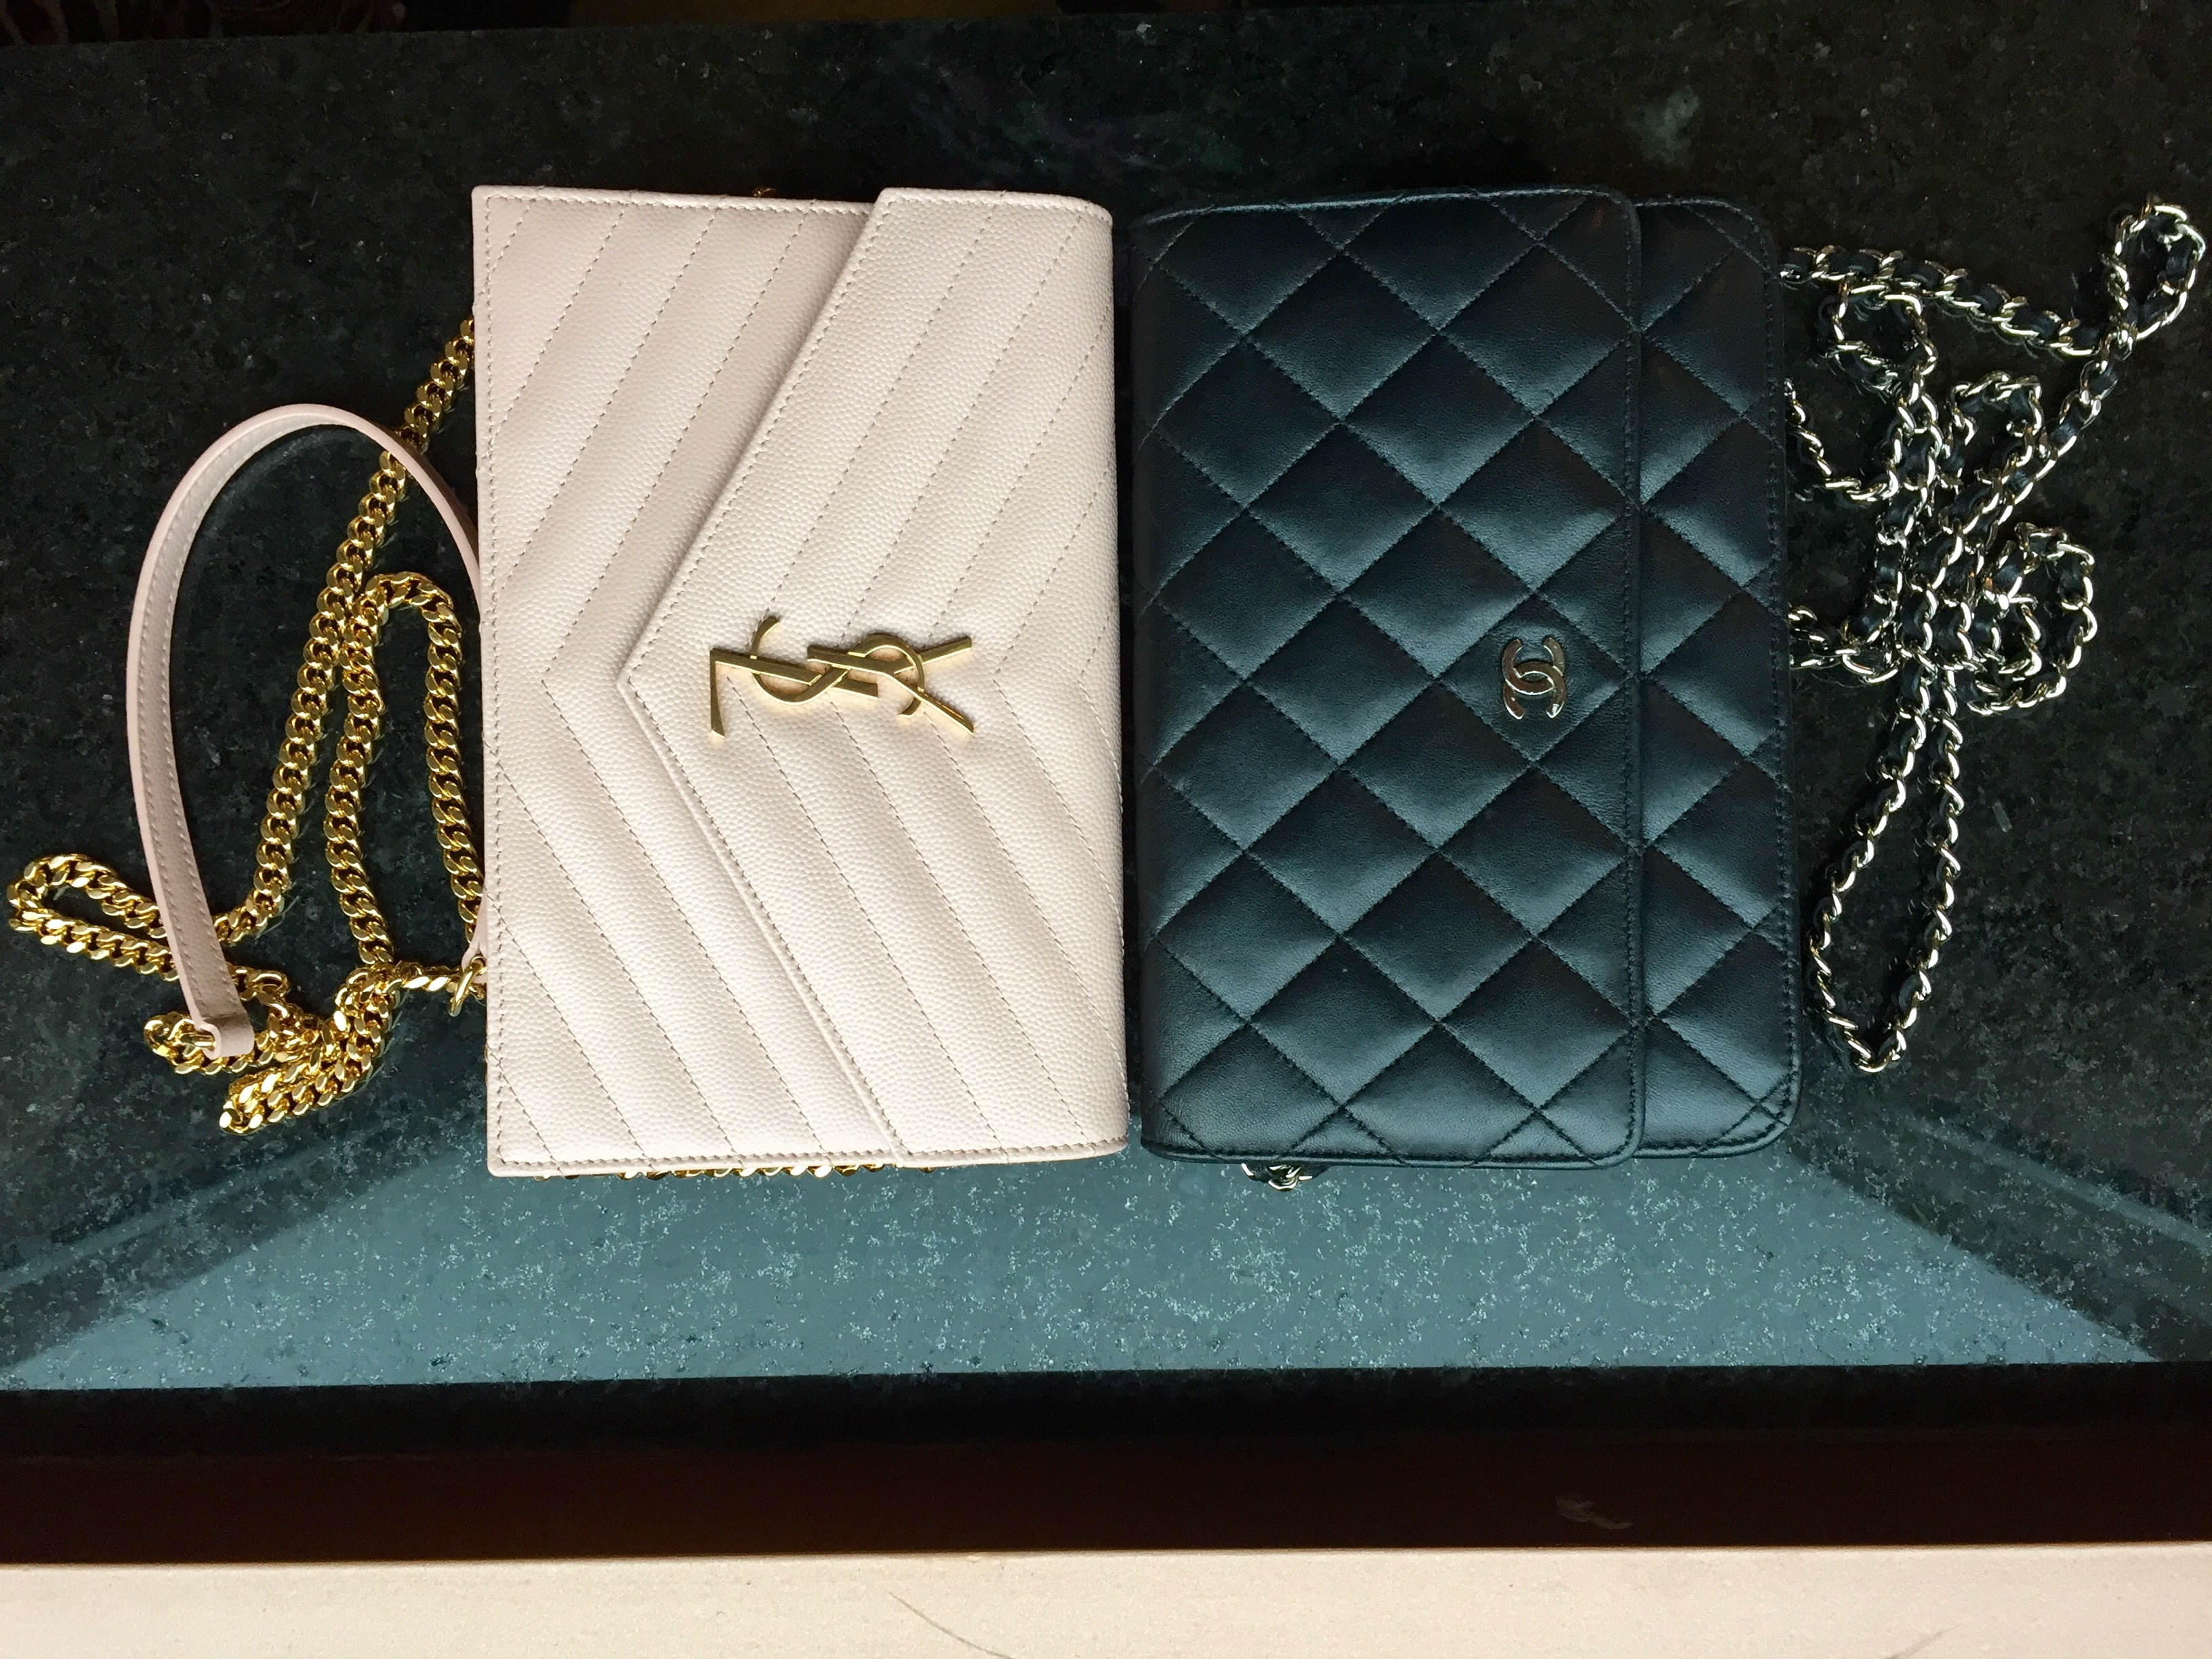 4c48699b6bbe Chanel vs. YSL Wallet on Chain Comparison (WOC) - PurseBop